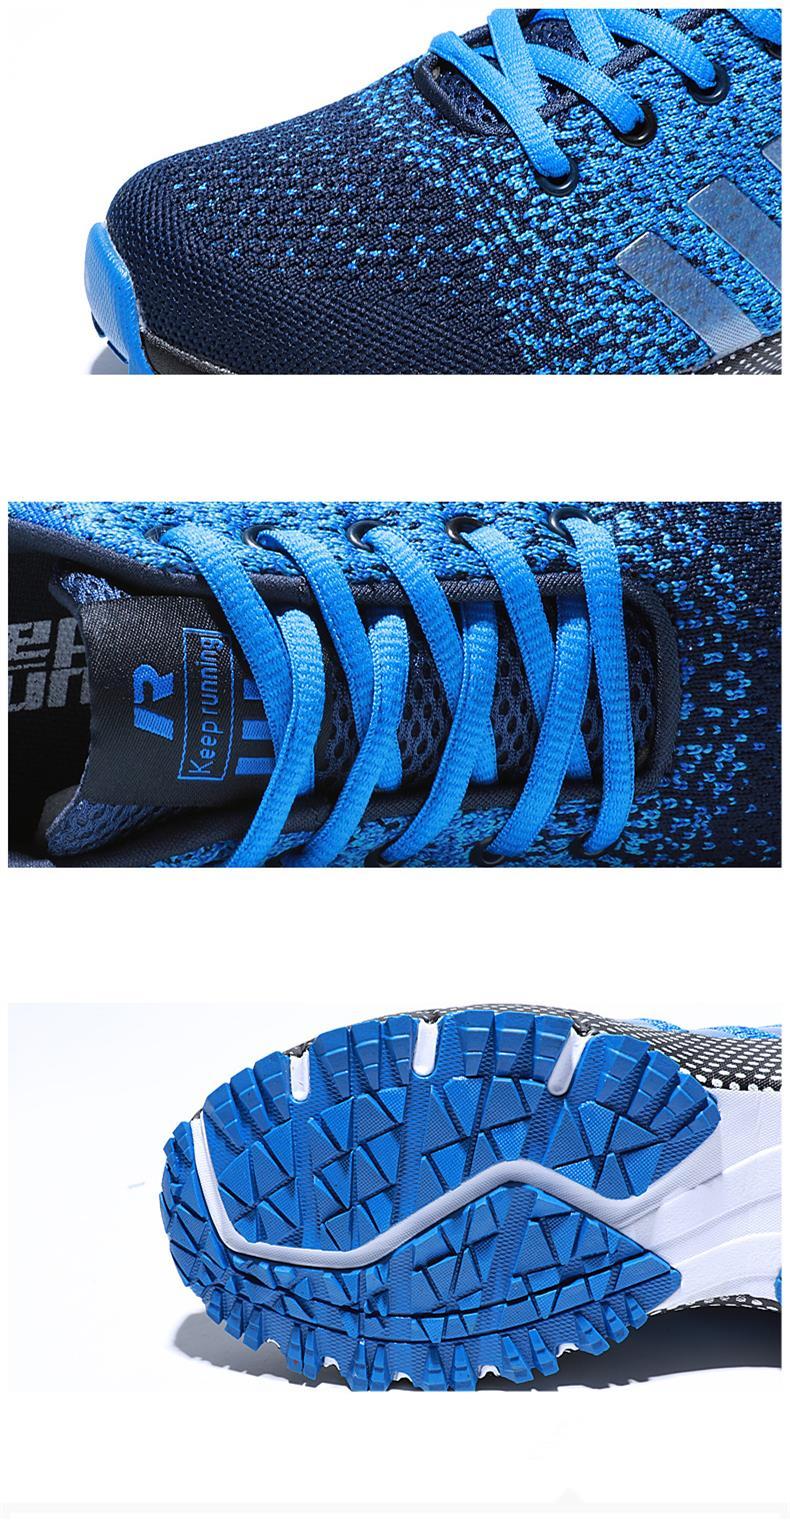 HTB1facKc6fguuRjSszcq6zb7FXaY 2018 Hot sale Spring Autumn Men Casual Shoes Plus Size 36-47 Breathable Men Shoes Casual Footwear Unisex Sneakers Men Trainers